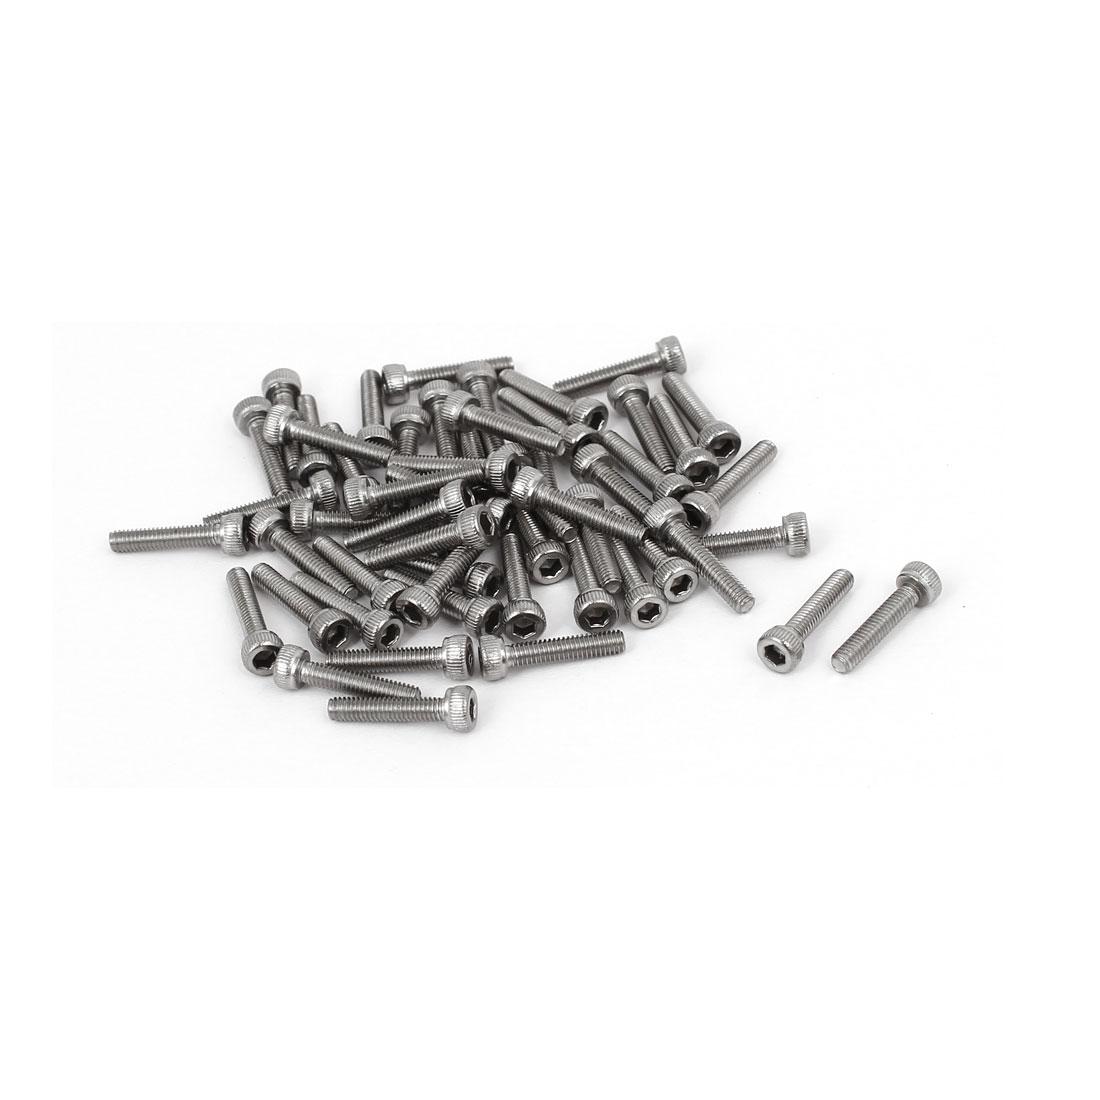 M2.5 x 12mm Thread 304 Stainless Steel Hex Socket Head Cap Screw DIN912 55pcs